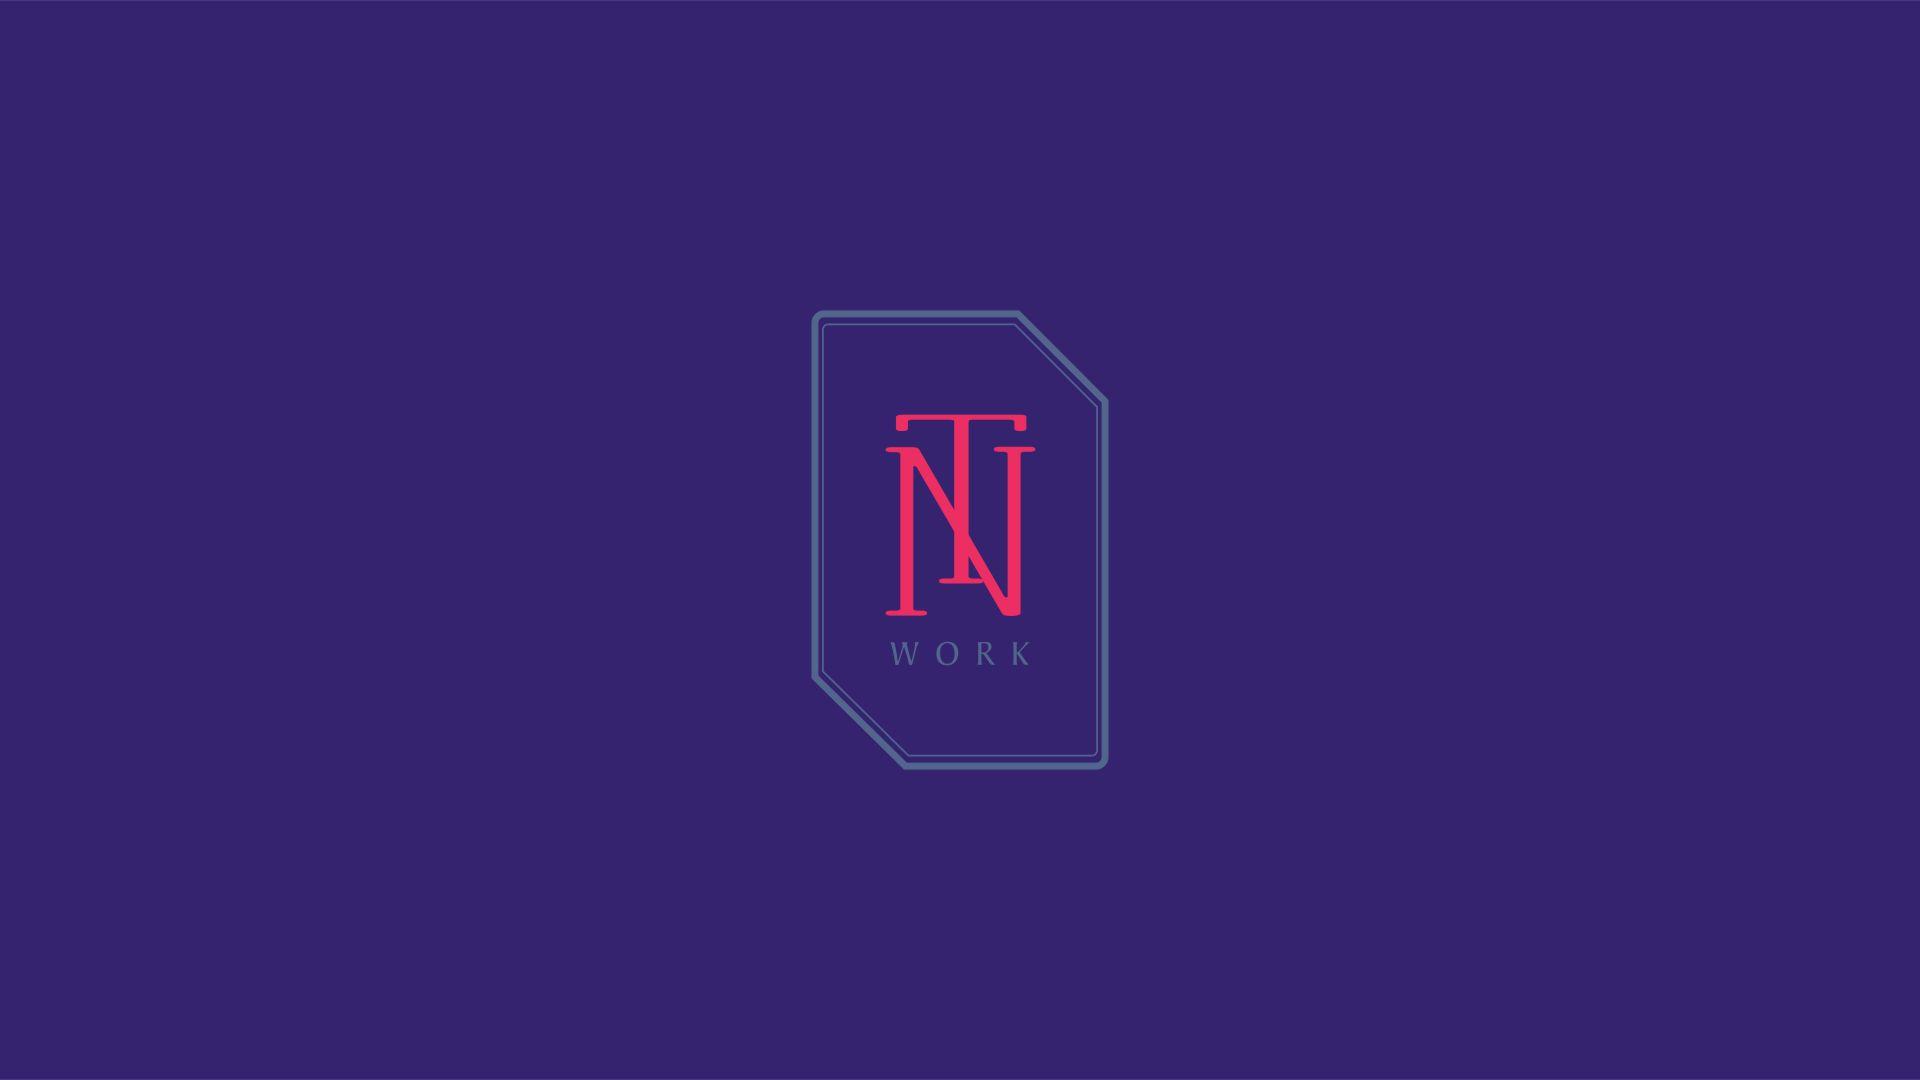 NT Work